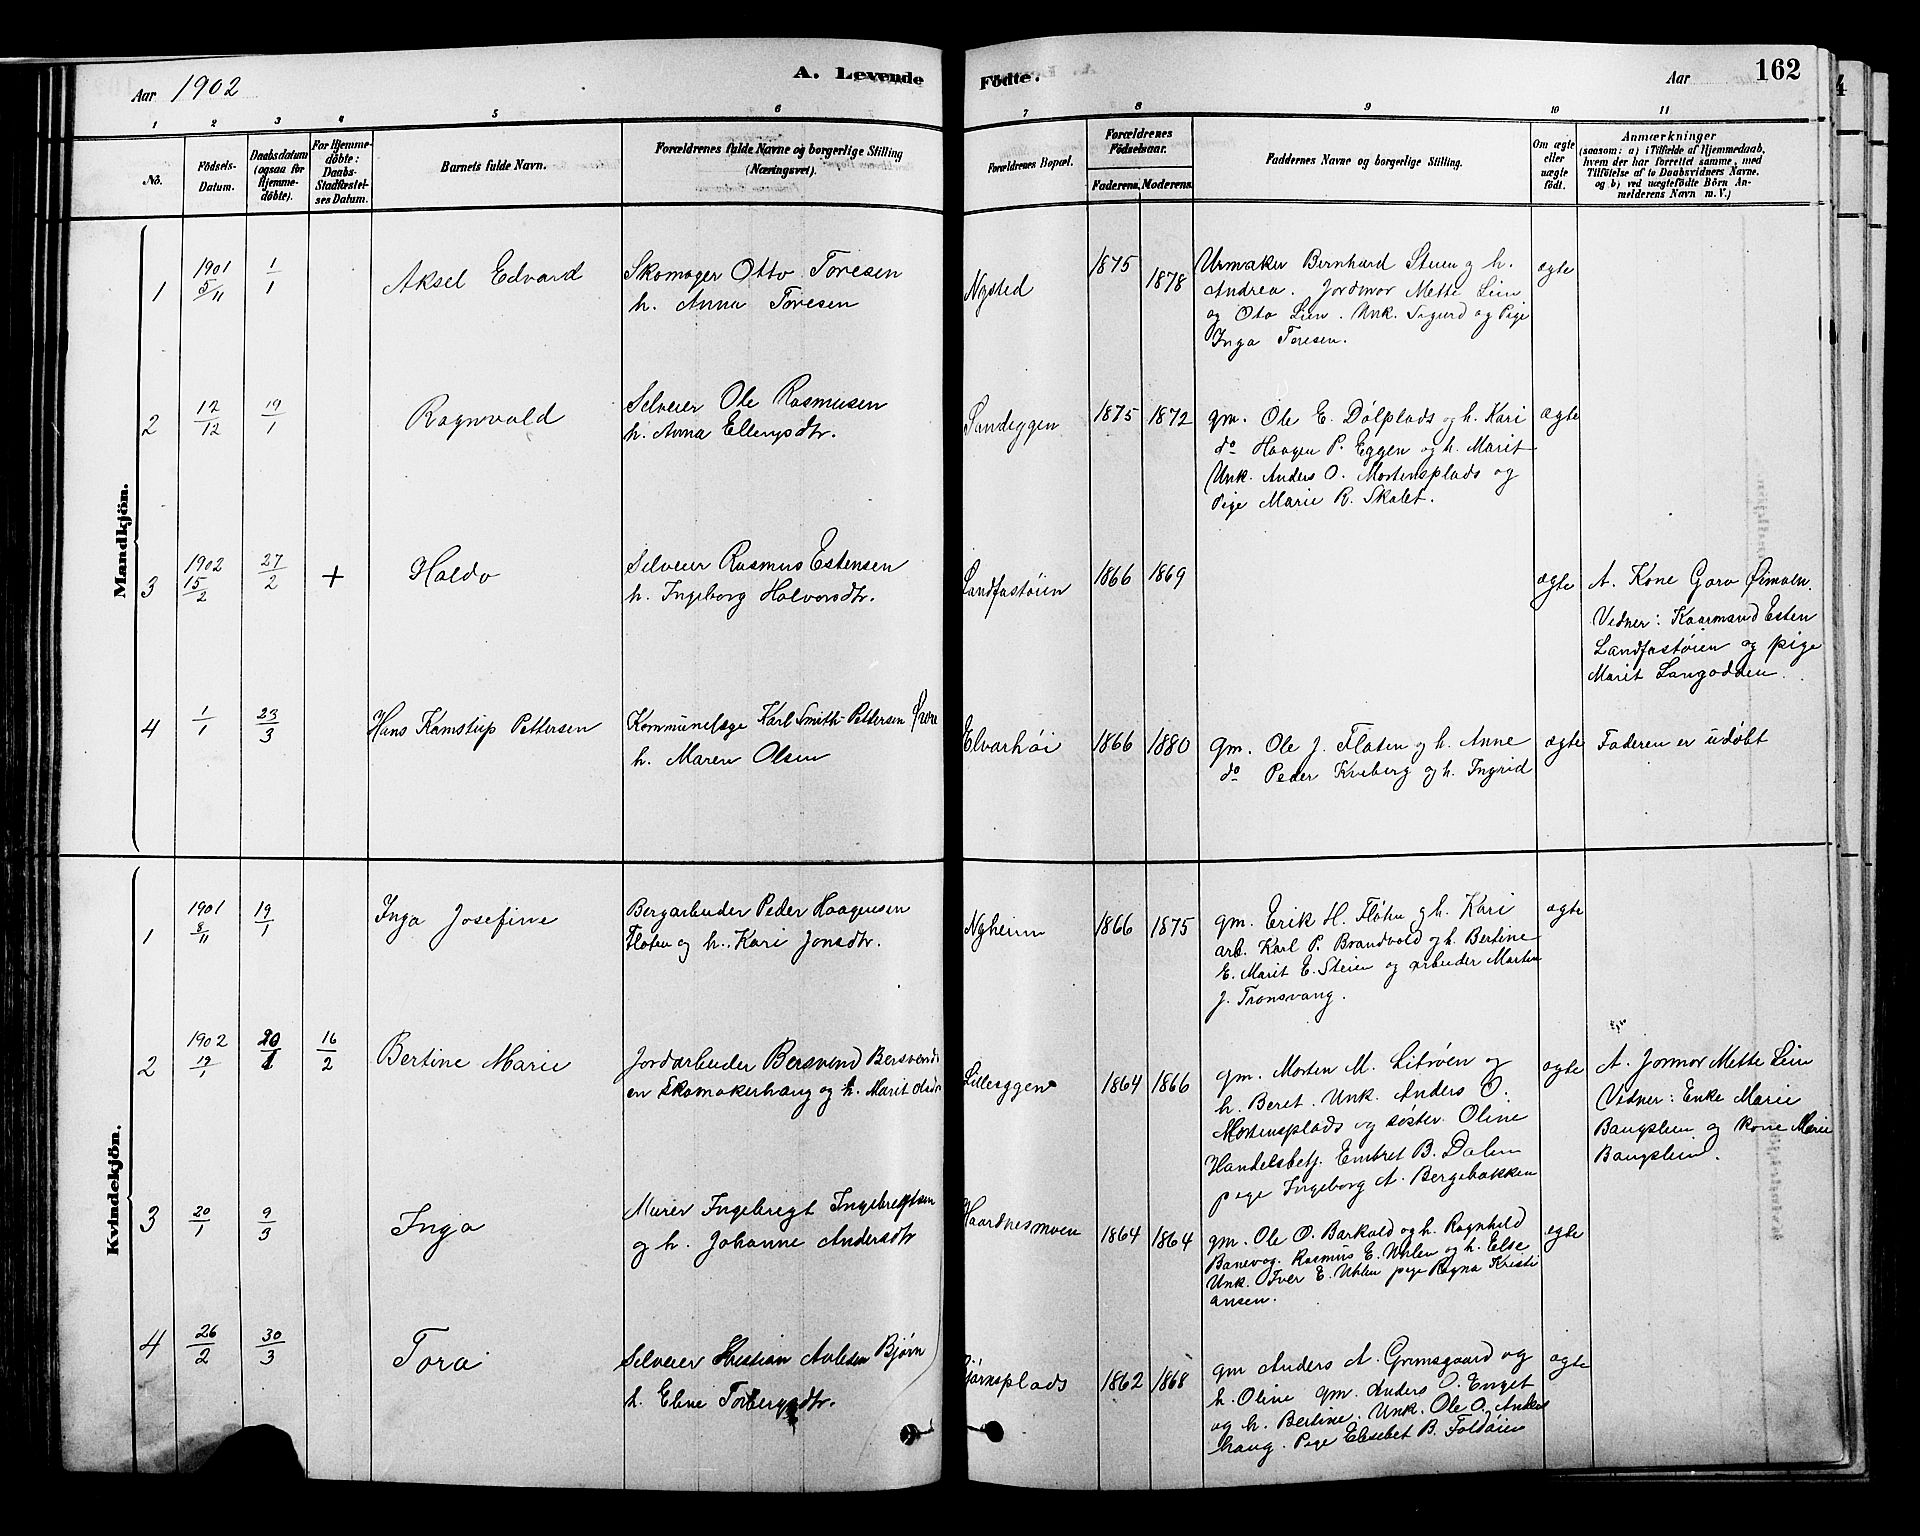 SAH, Alvdal prestekontor, Klokkerbok nr. 3, 1878-1907, s. 162